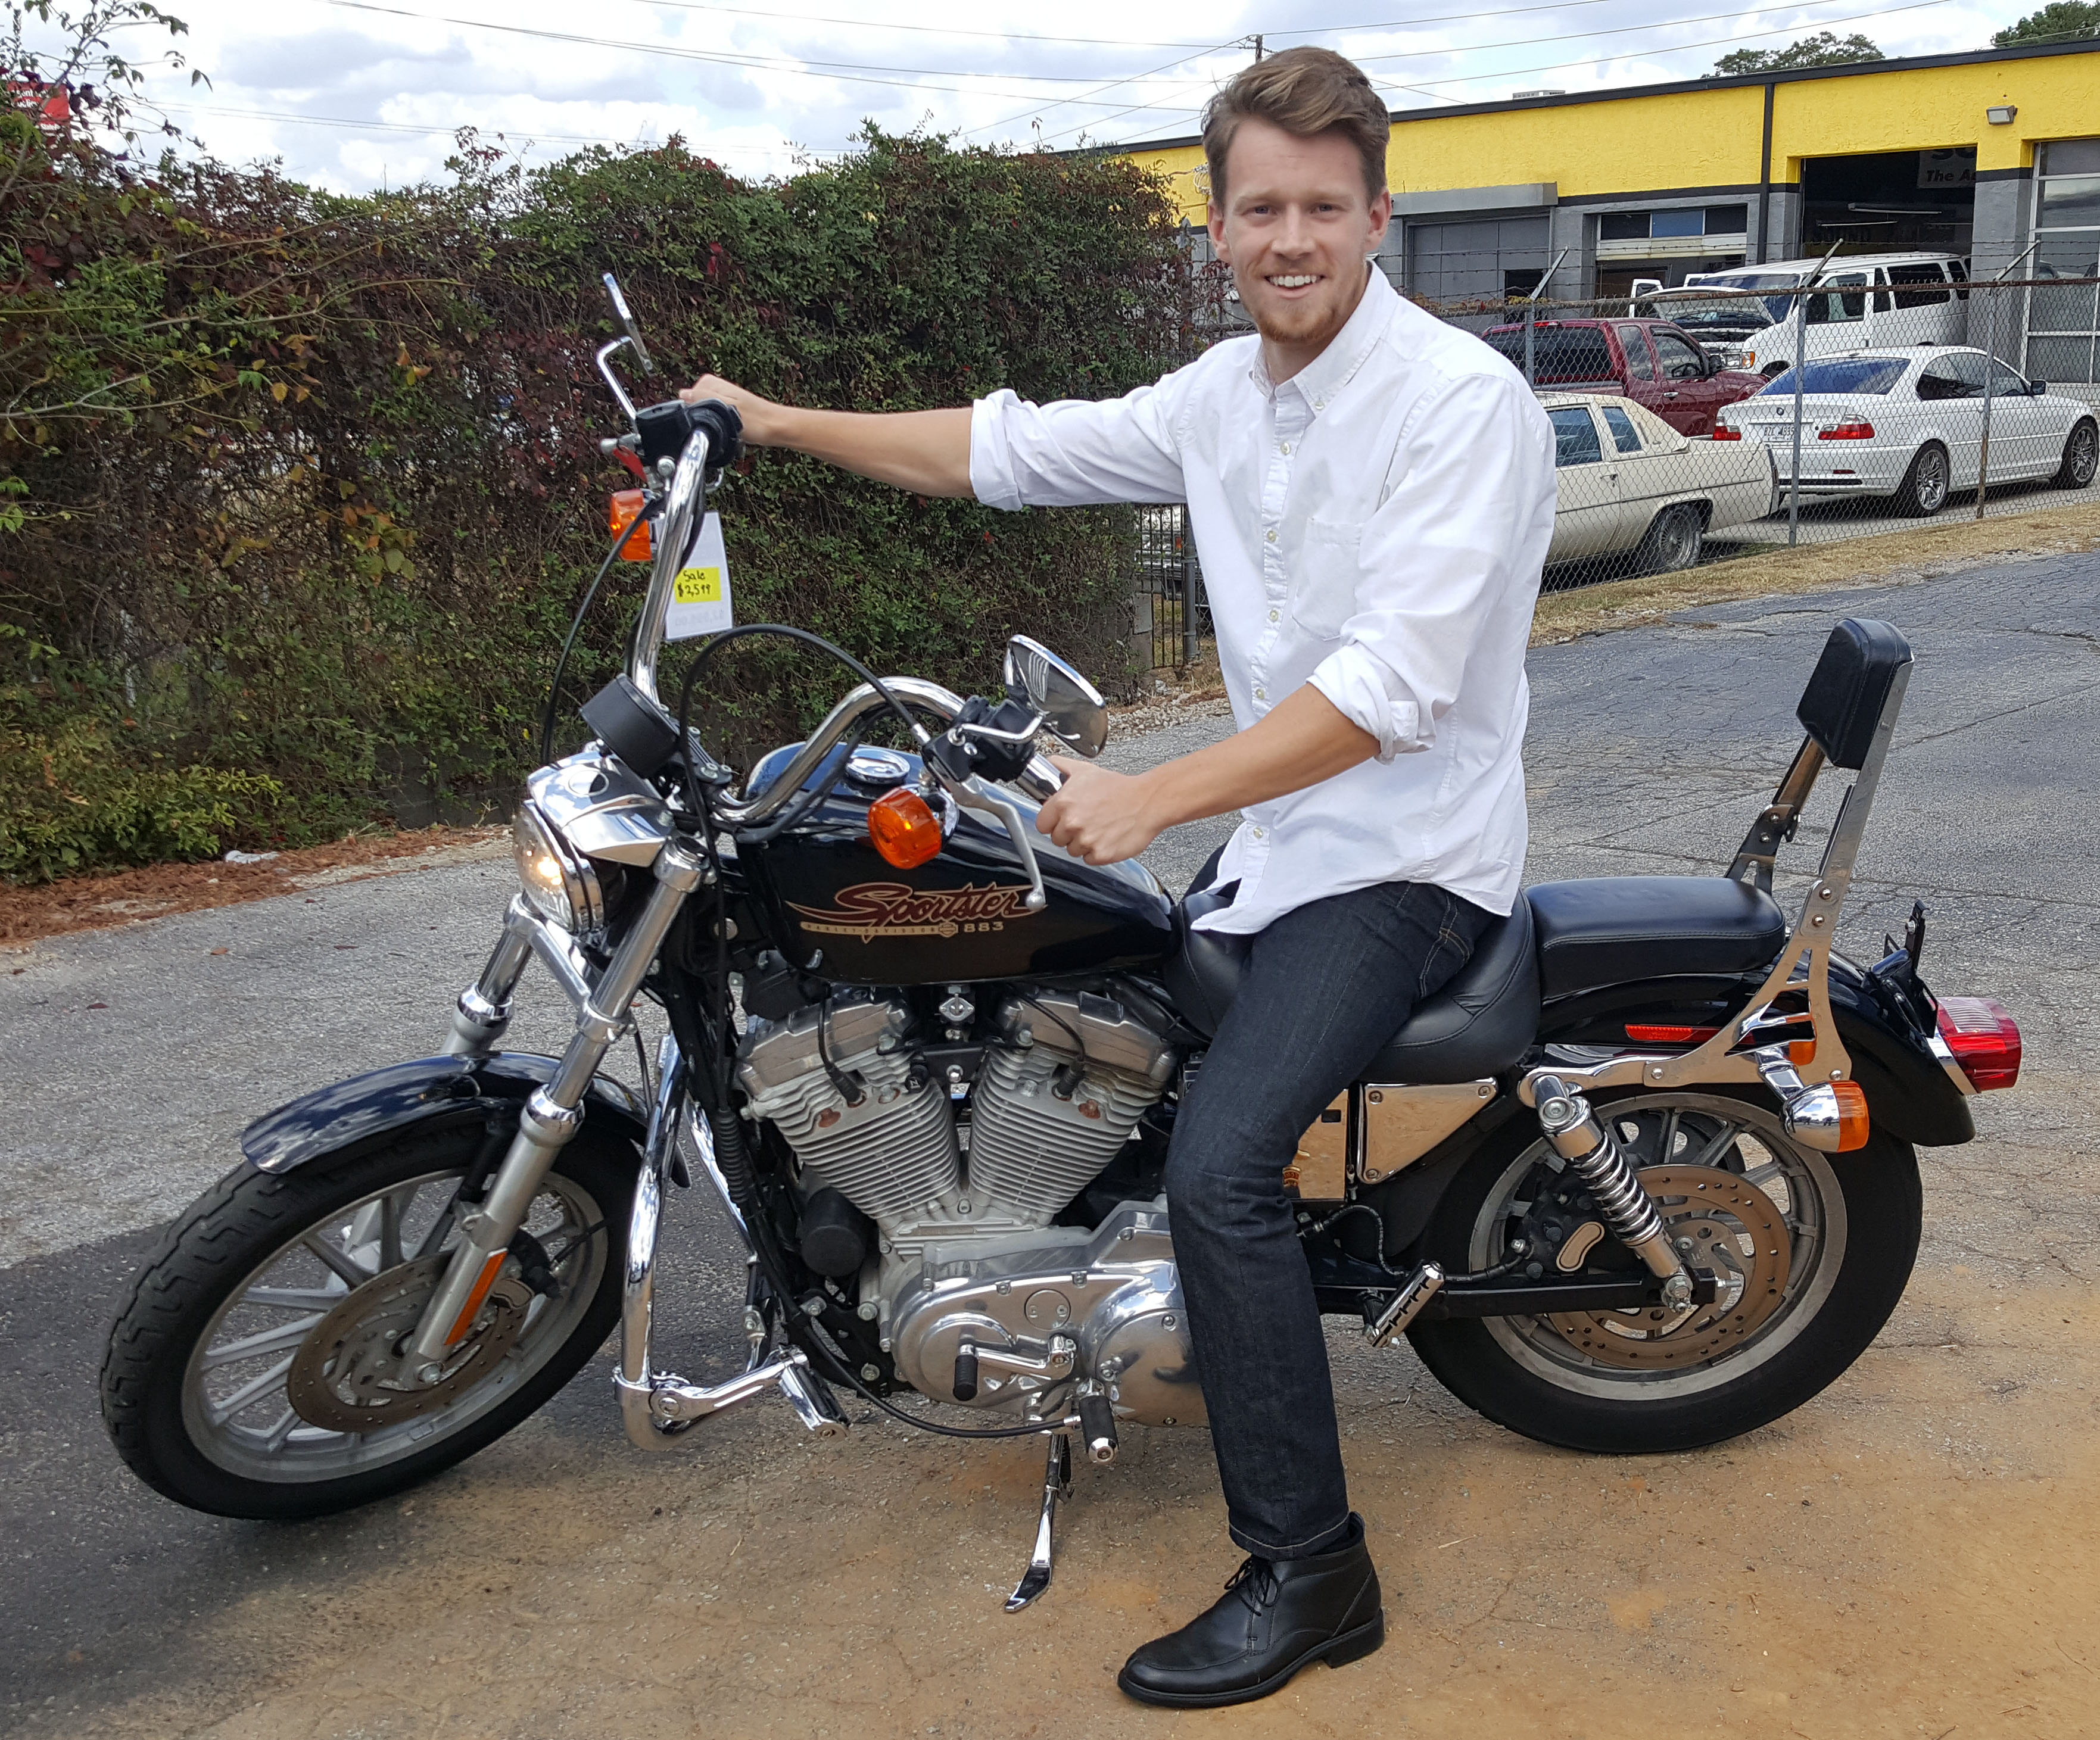 Ronald B. with 2001 Harley-Davidson XL883 Hugger